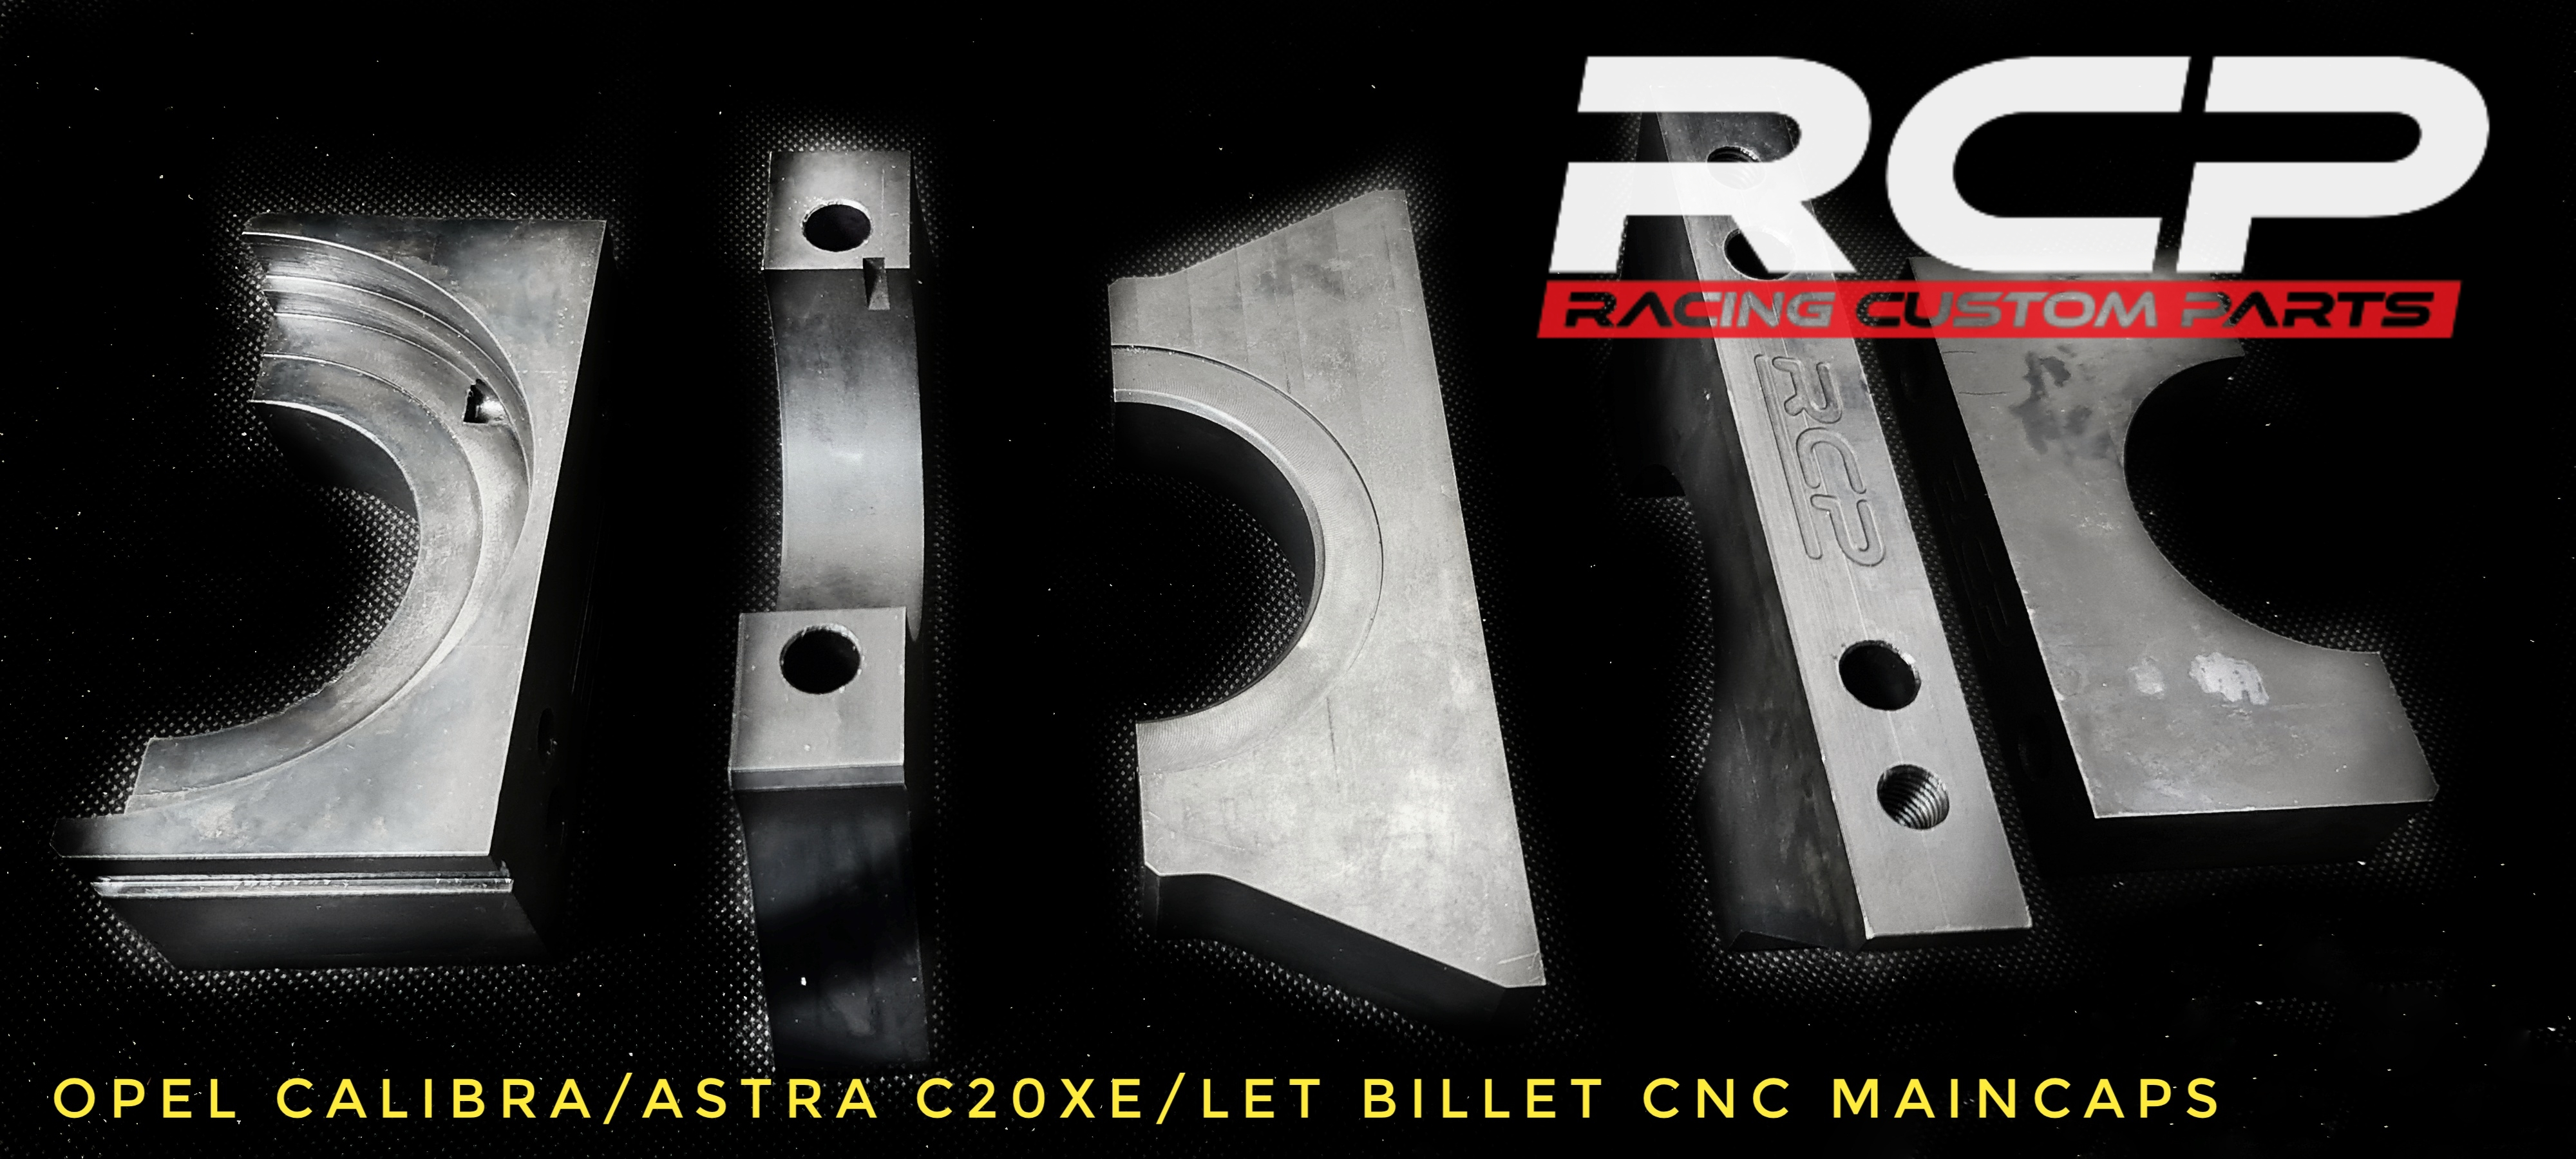 opel vauxhall holden calibra astra vectra turbo 2.0 c20xe c20let x20xer z20let billet cnc maincaps rcp racingcustomparts opel classic